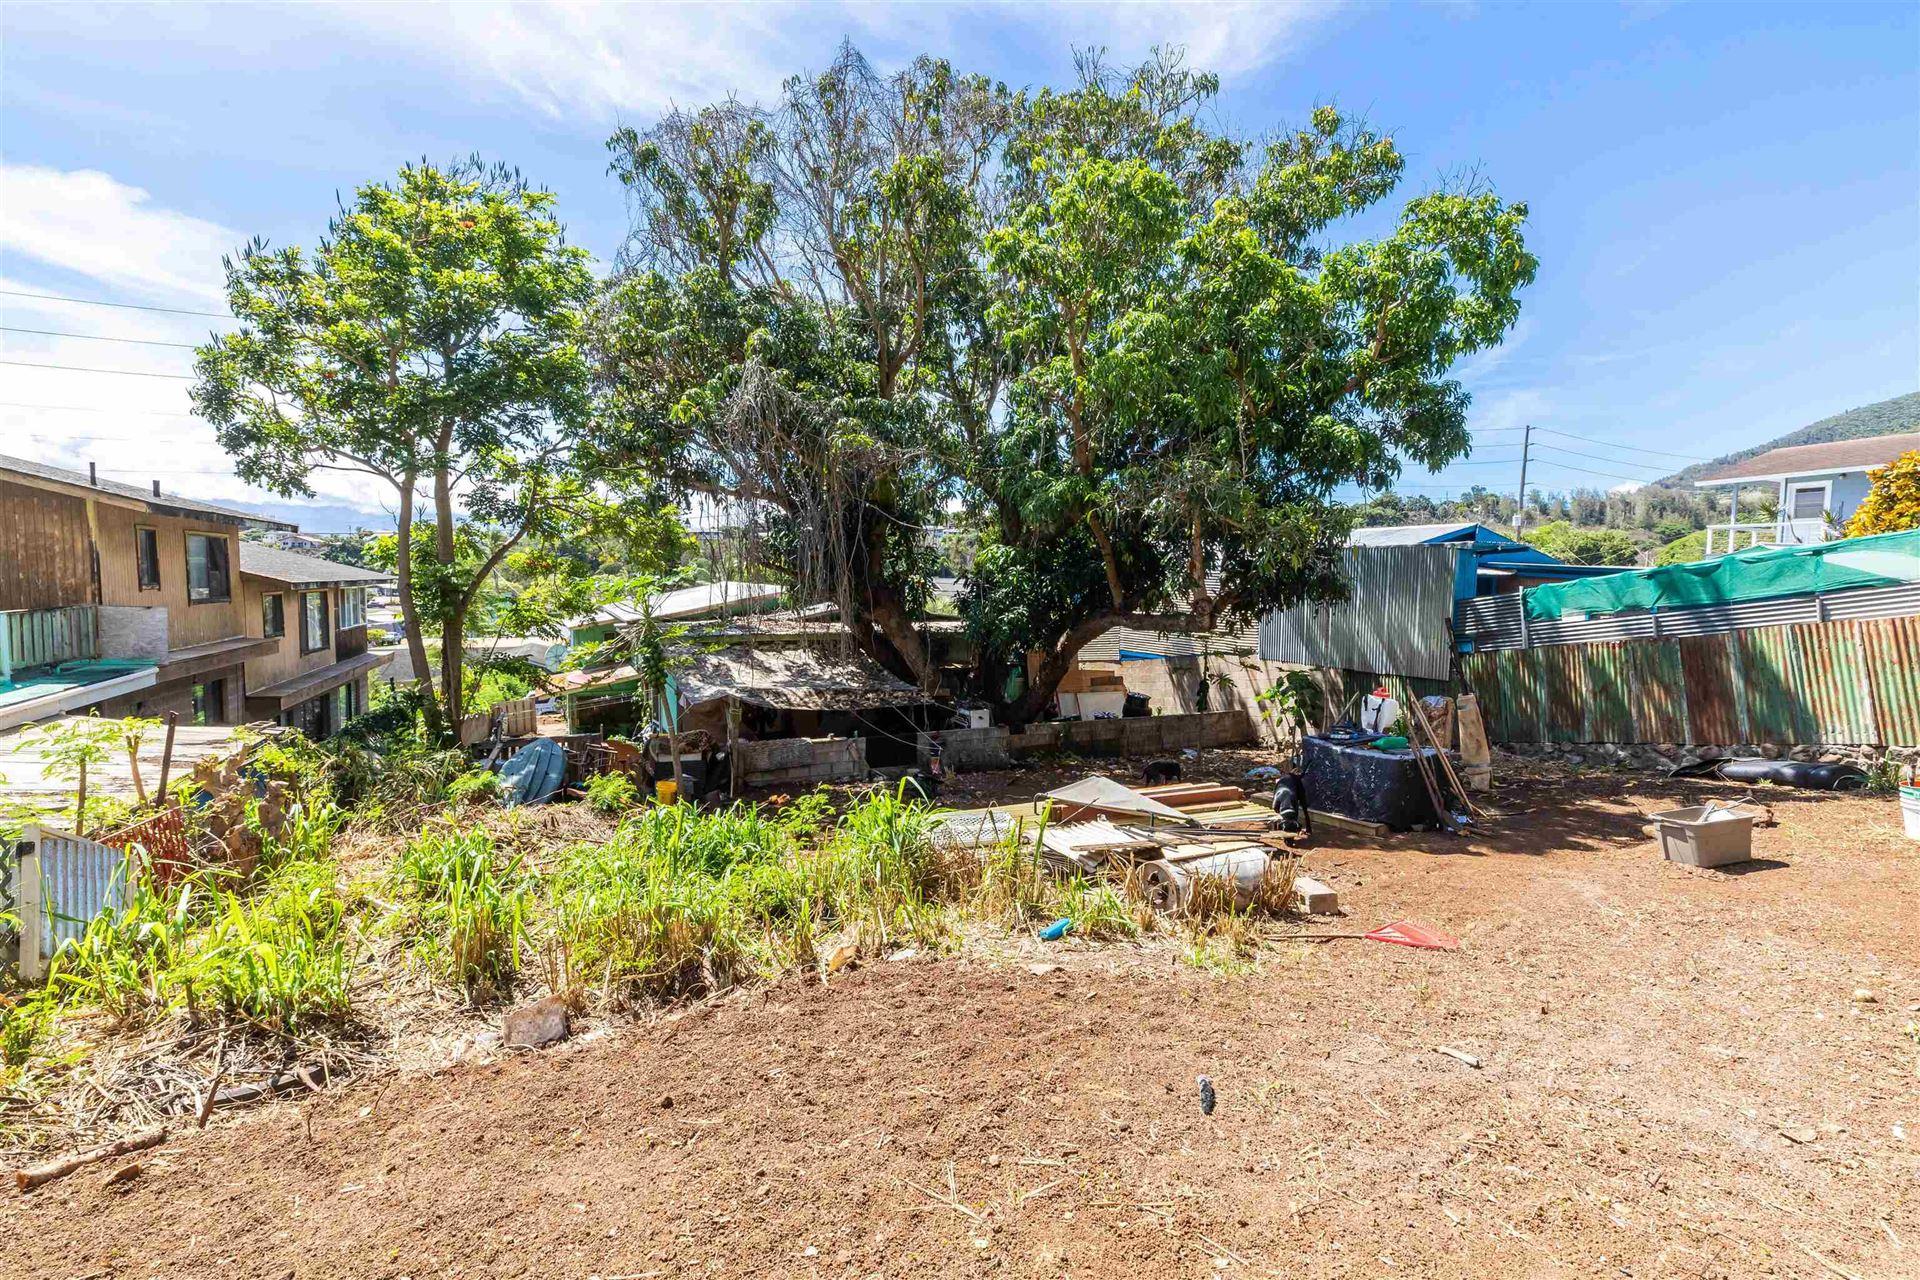 Photo of 2224 Mokuhau Rd, Wailuku, HI 96793 (MLS # 392887)